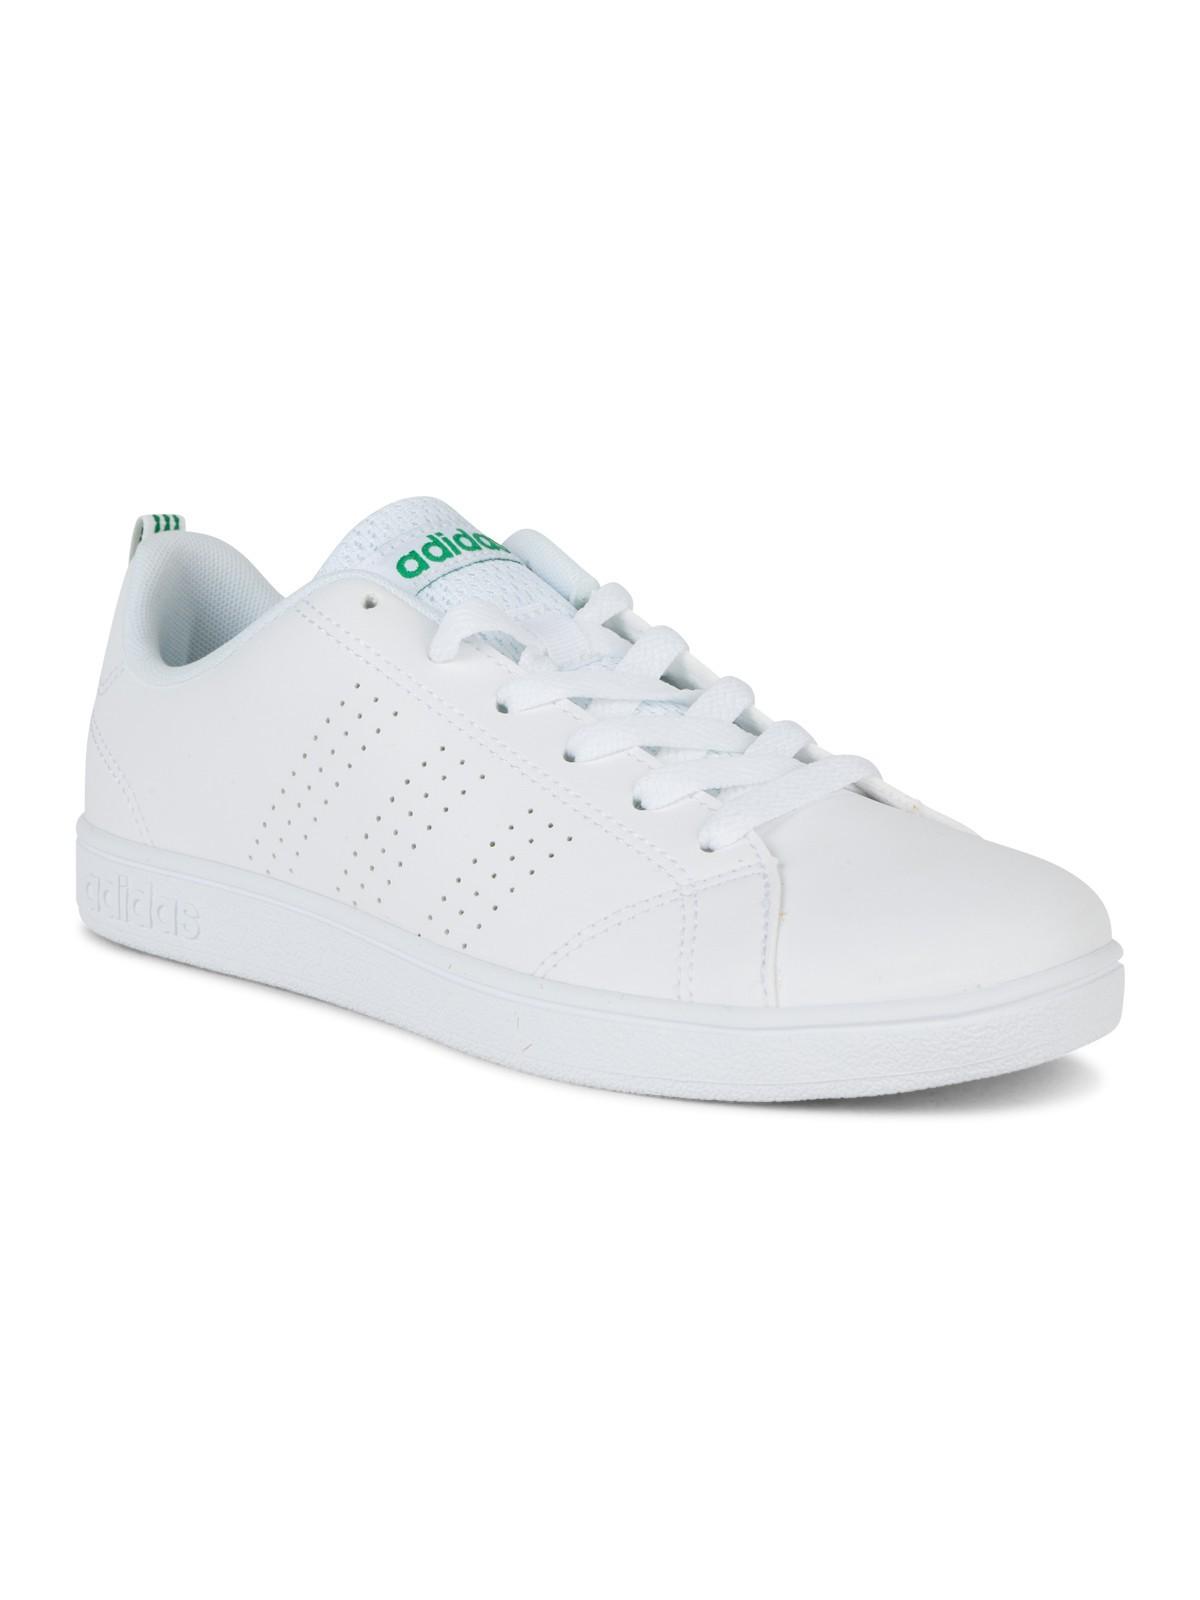 Baskets mode femme Adidas blanc (36 39) DistriCenter